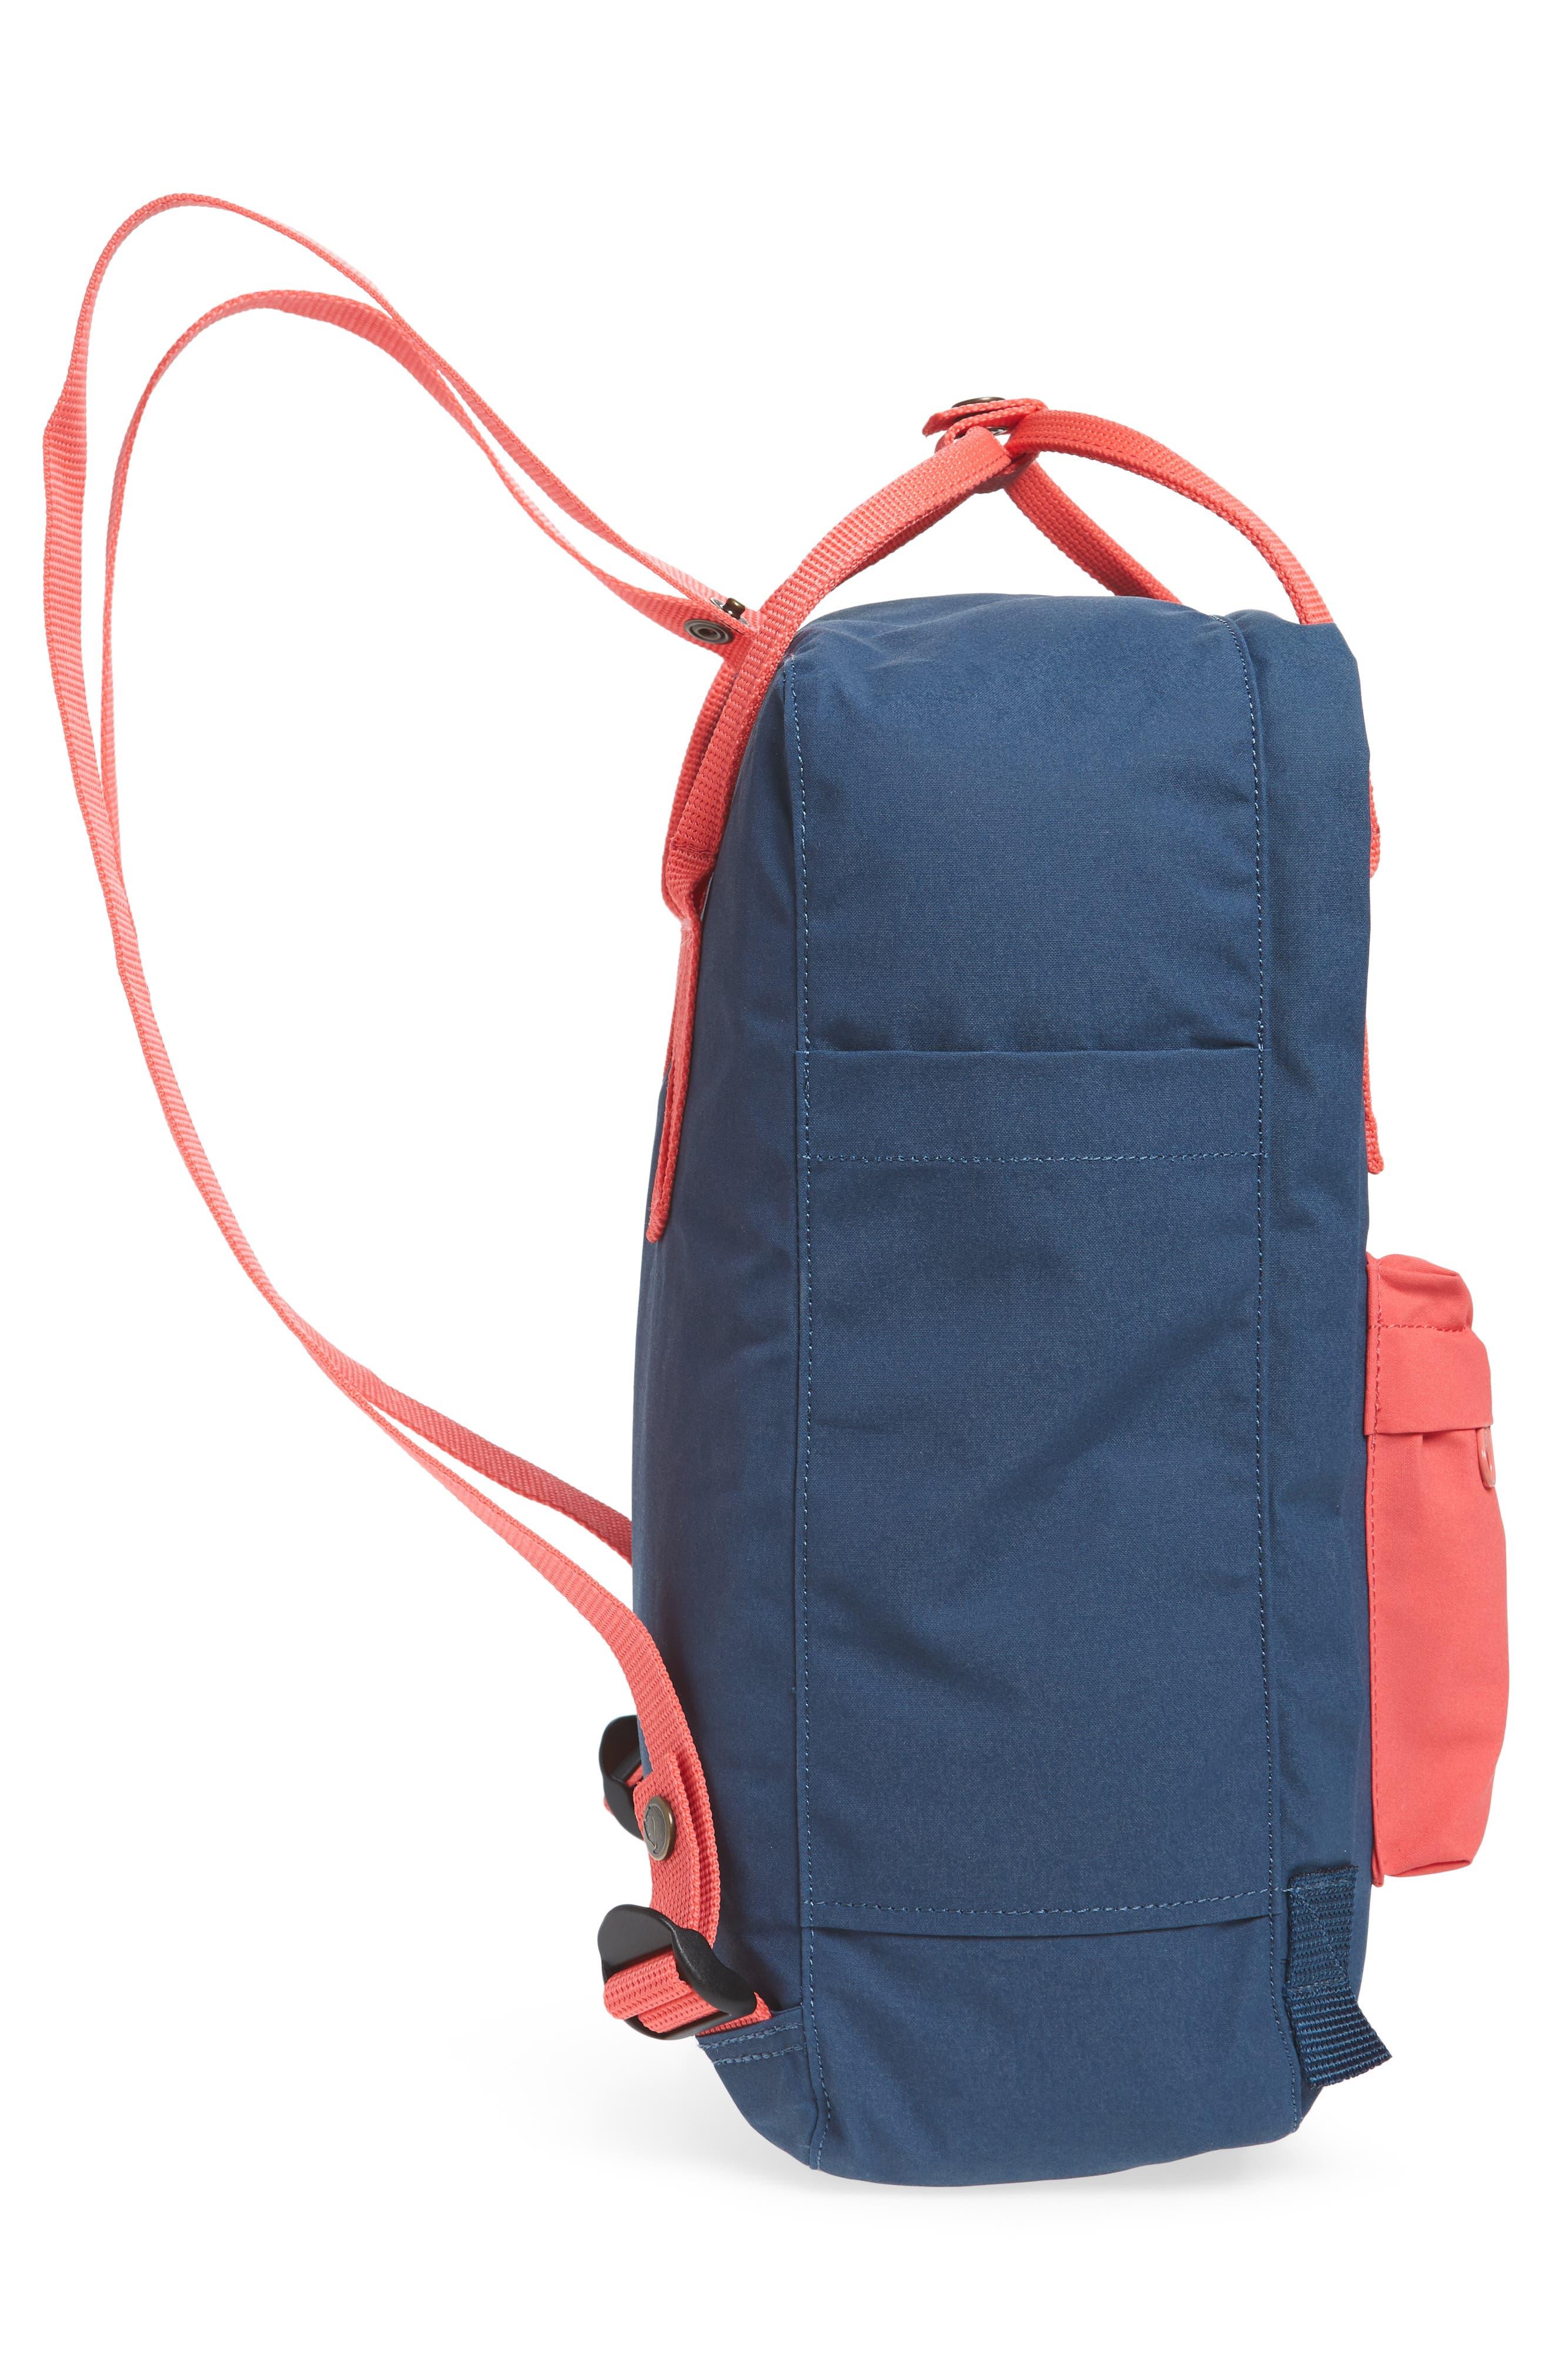 Arctic Fox Kånken Backpack,                             Alternate thumbnail 5, color,                             ROYAL BLUE/ PEACH PINK